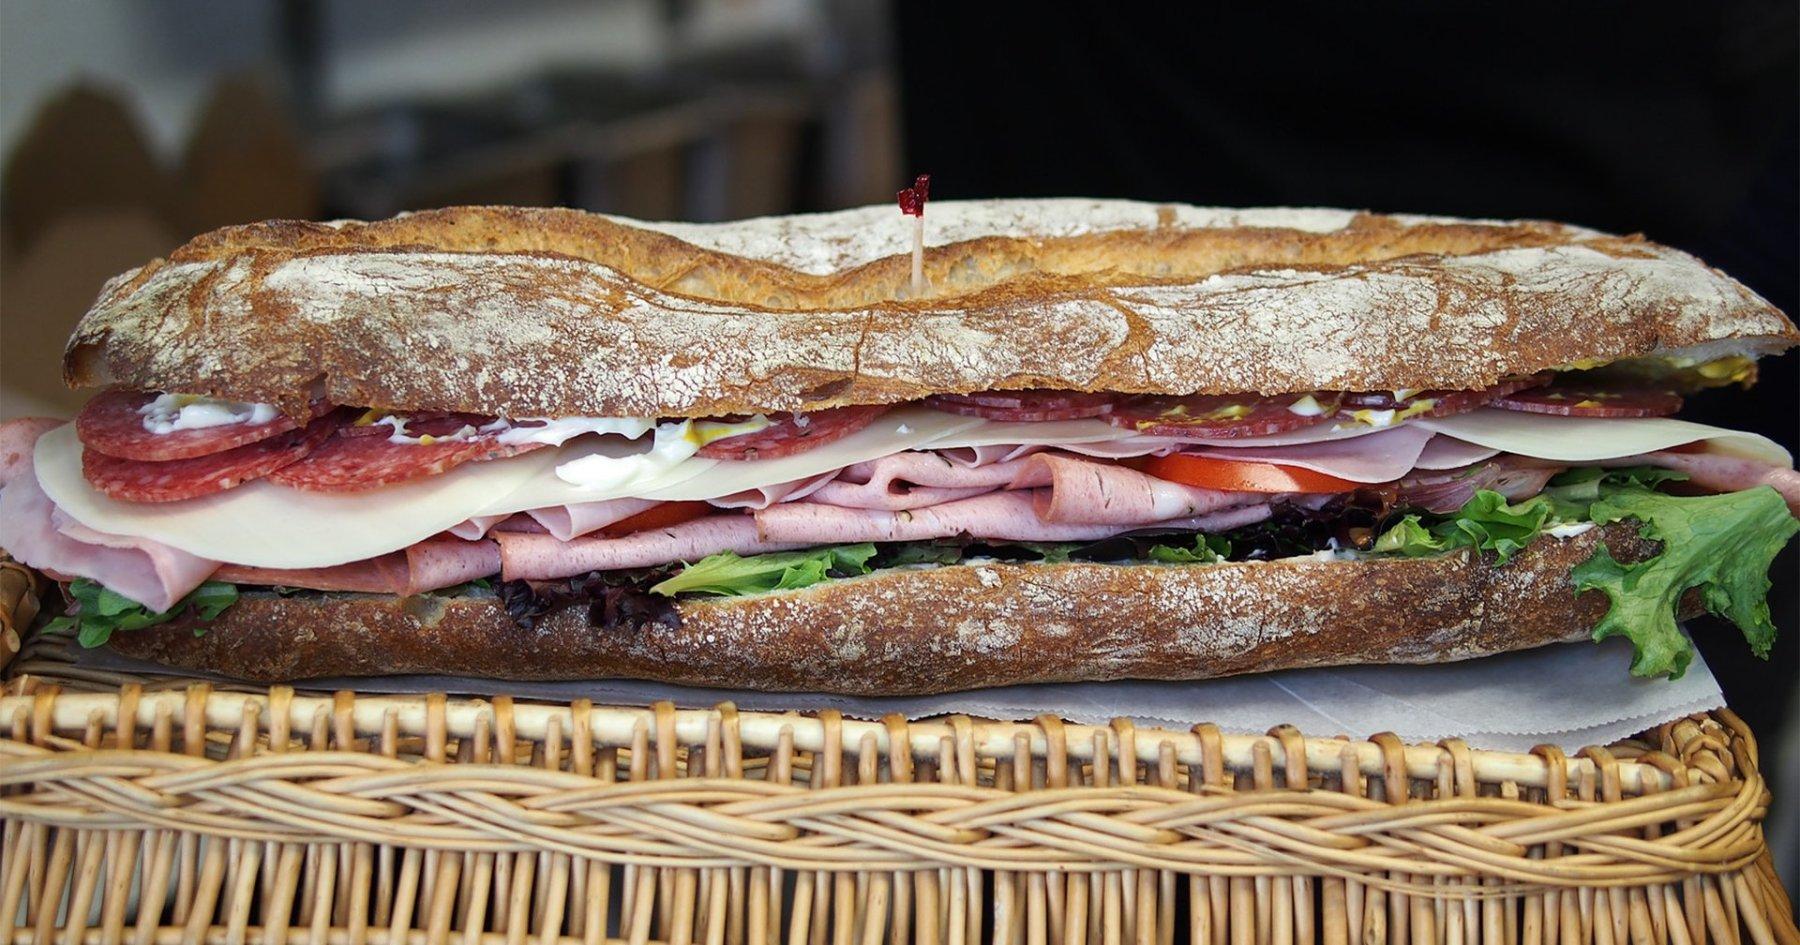 The SF Book of Sandwich, Vol. IV